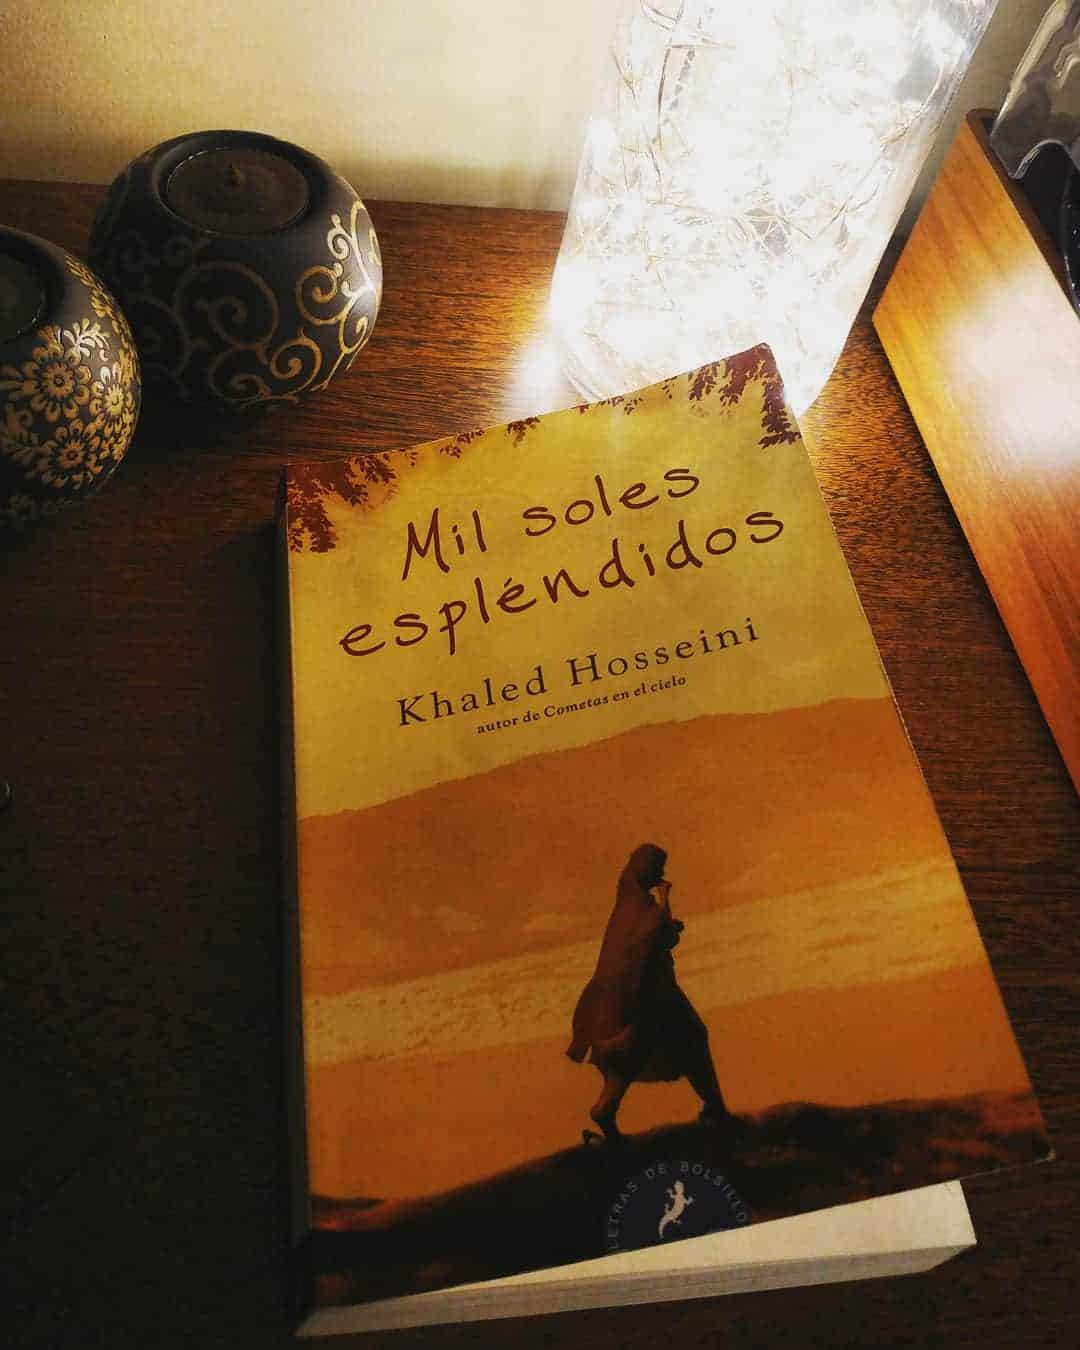 MIL SOLES ESPLÉNDIDOS DE KHALED HOSEINNI